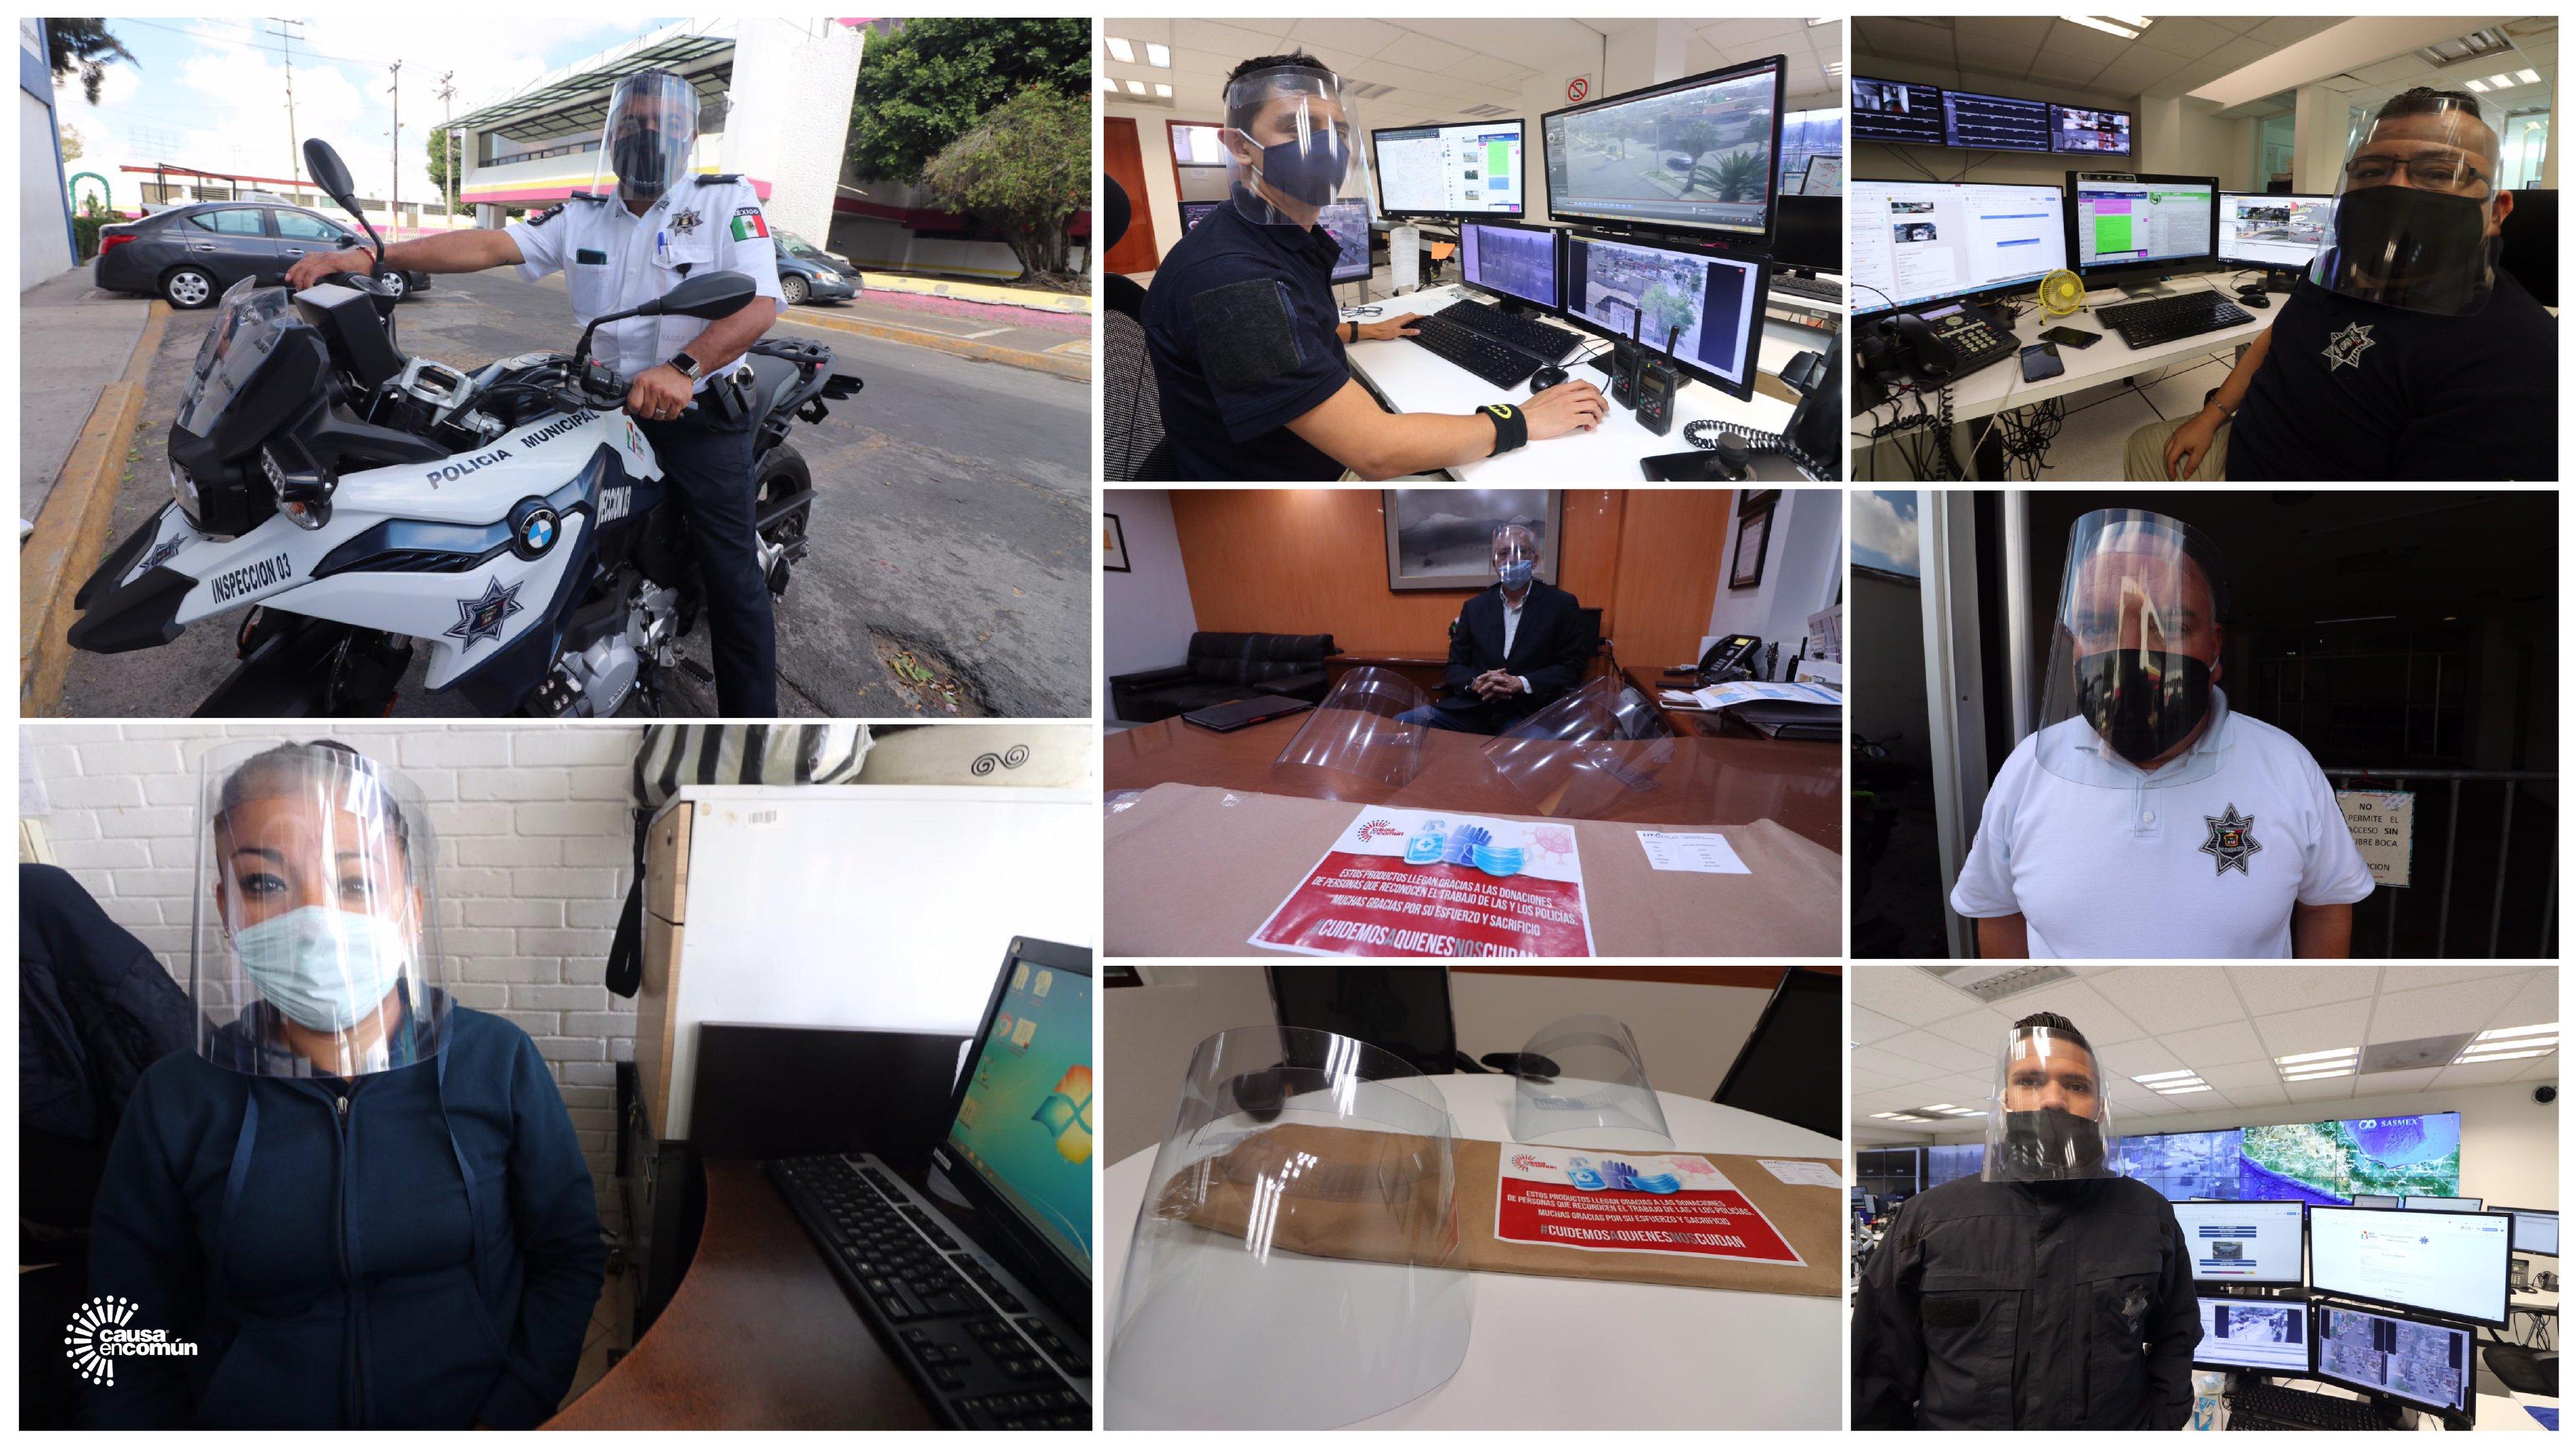 BUSCAN DONAR INSUMOS DE PROTECCIÓN PARA POLICÍAS